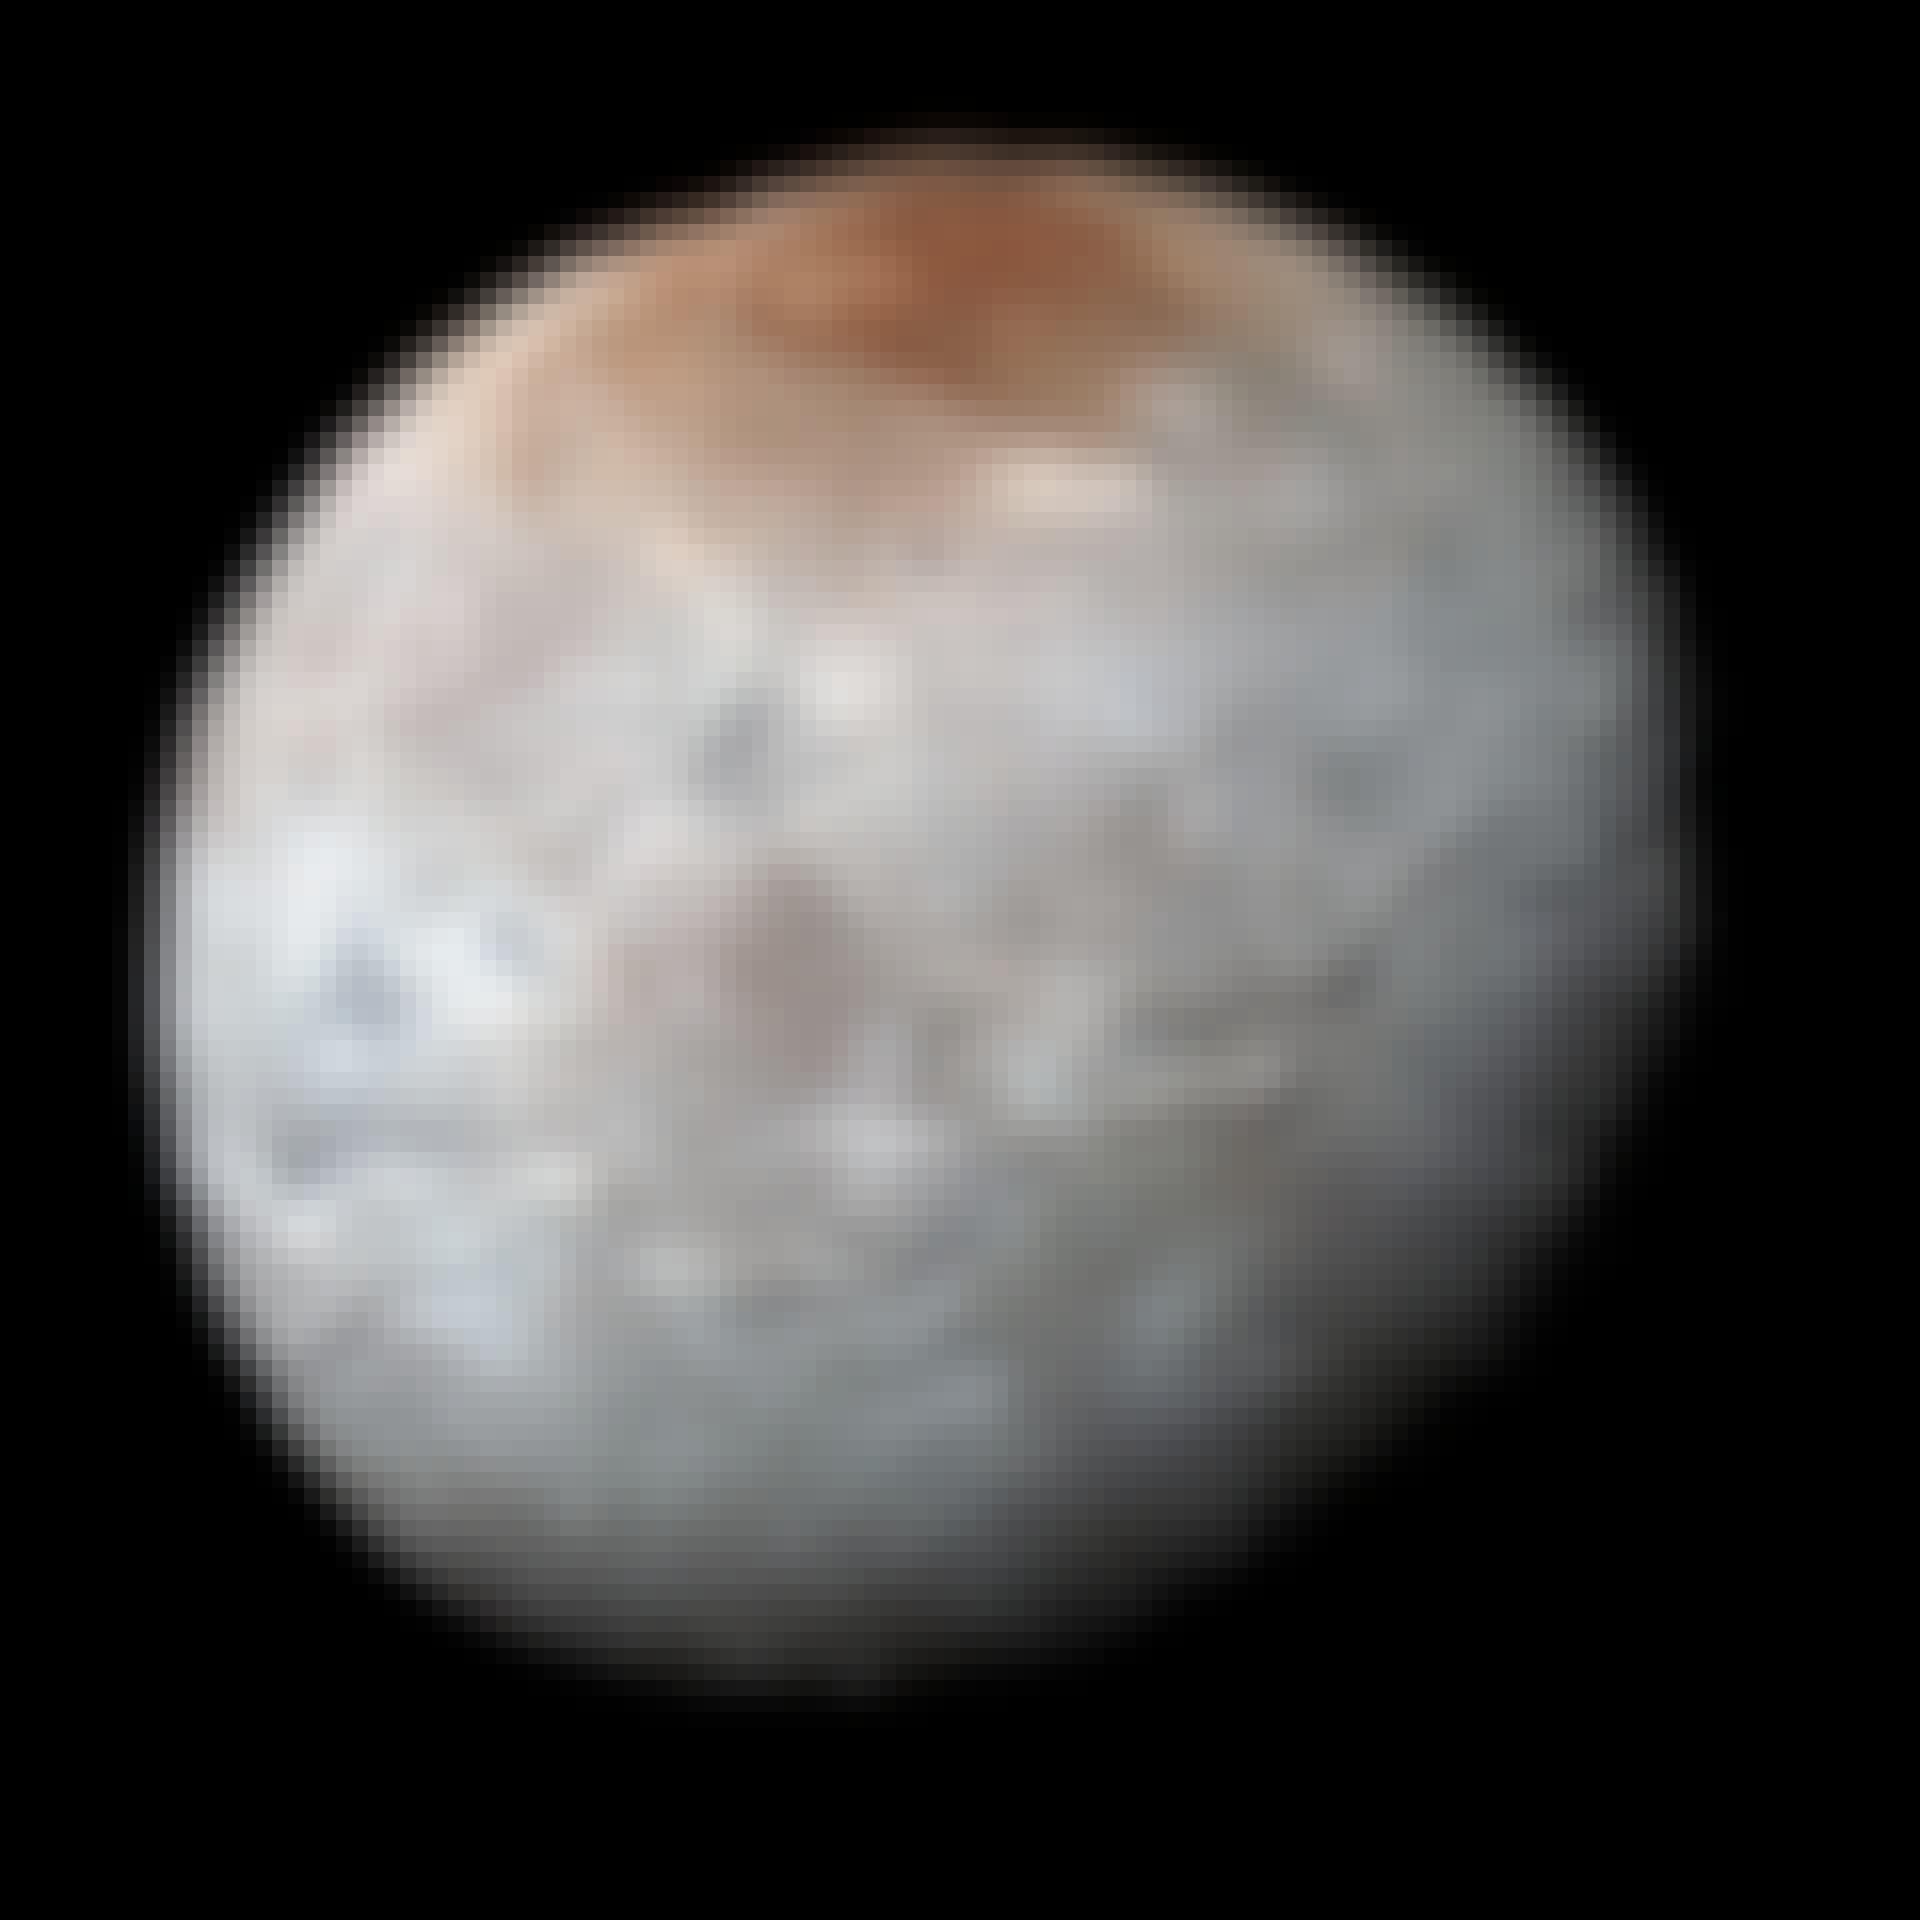 Charon, Plutos måne